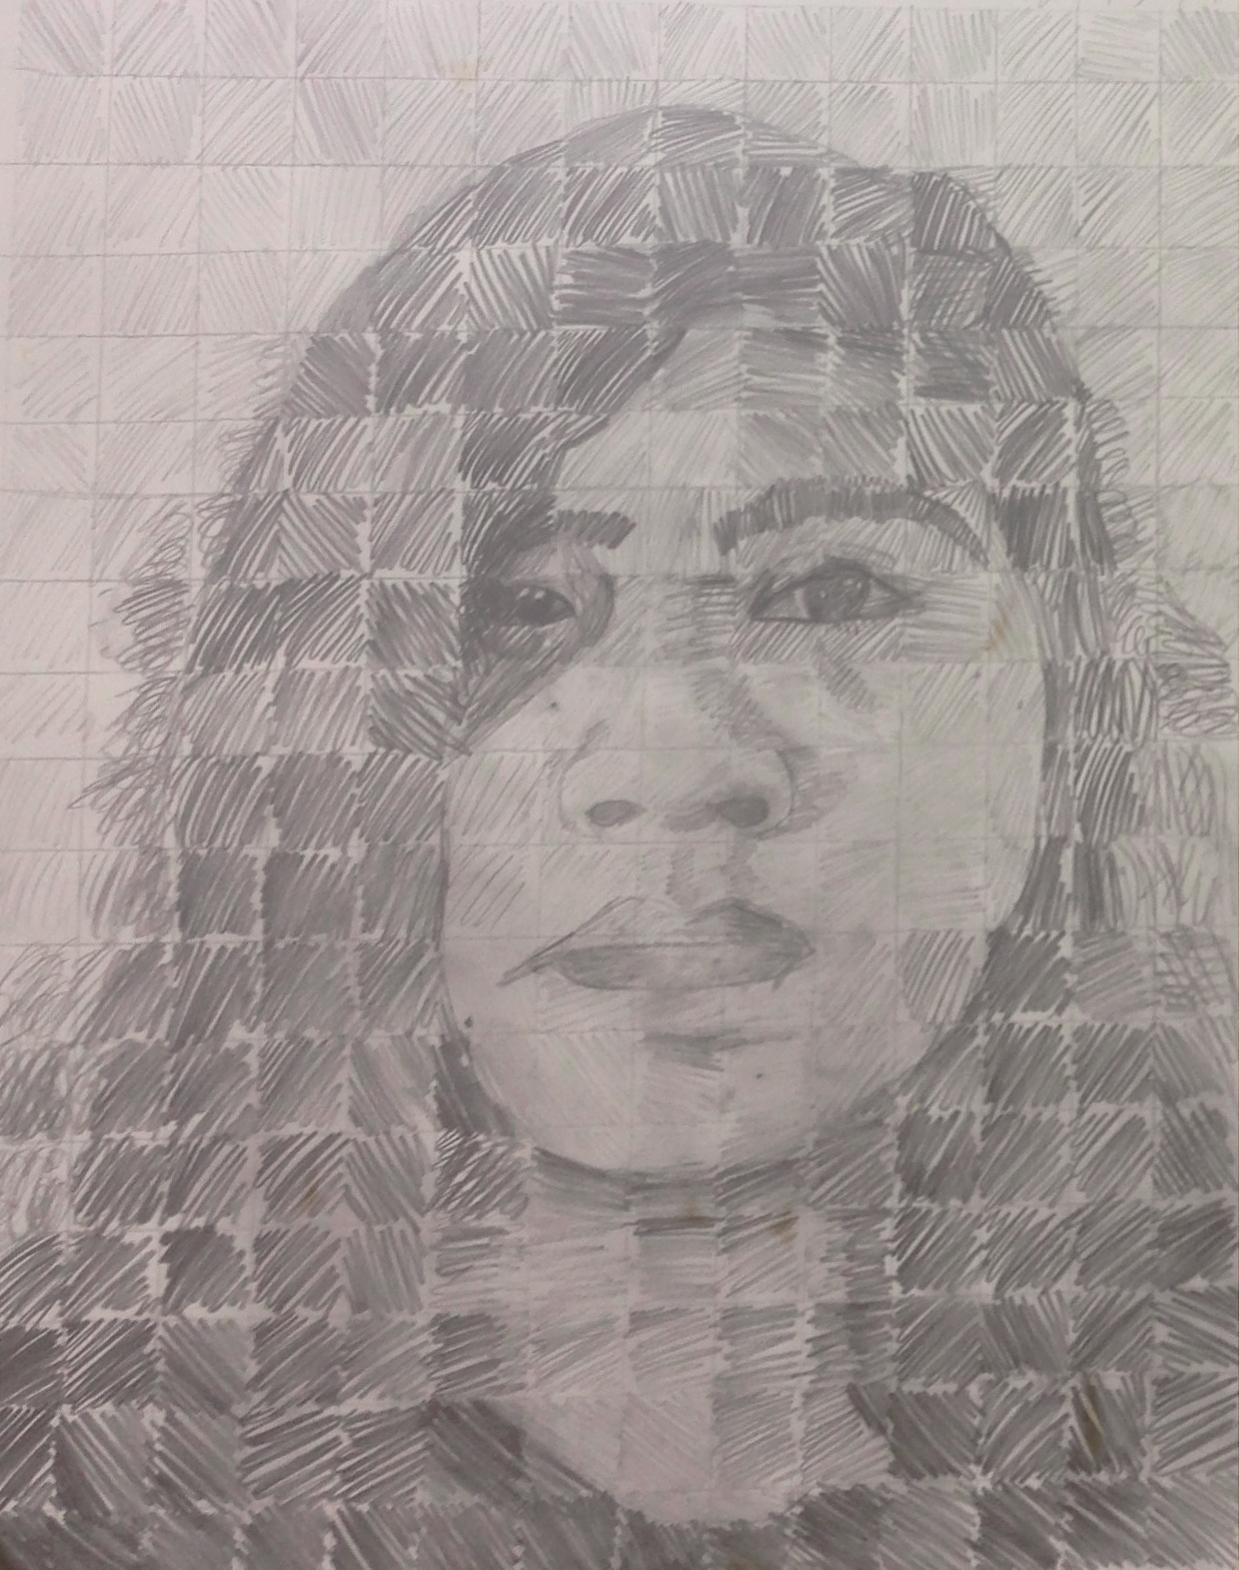 self portrait based on Chuck Close | 7th grade